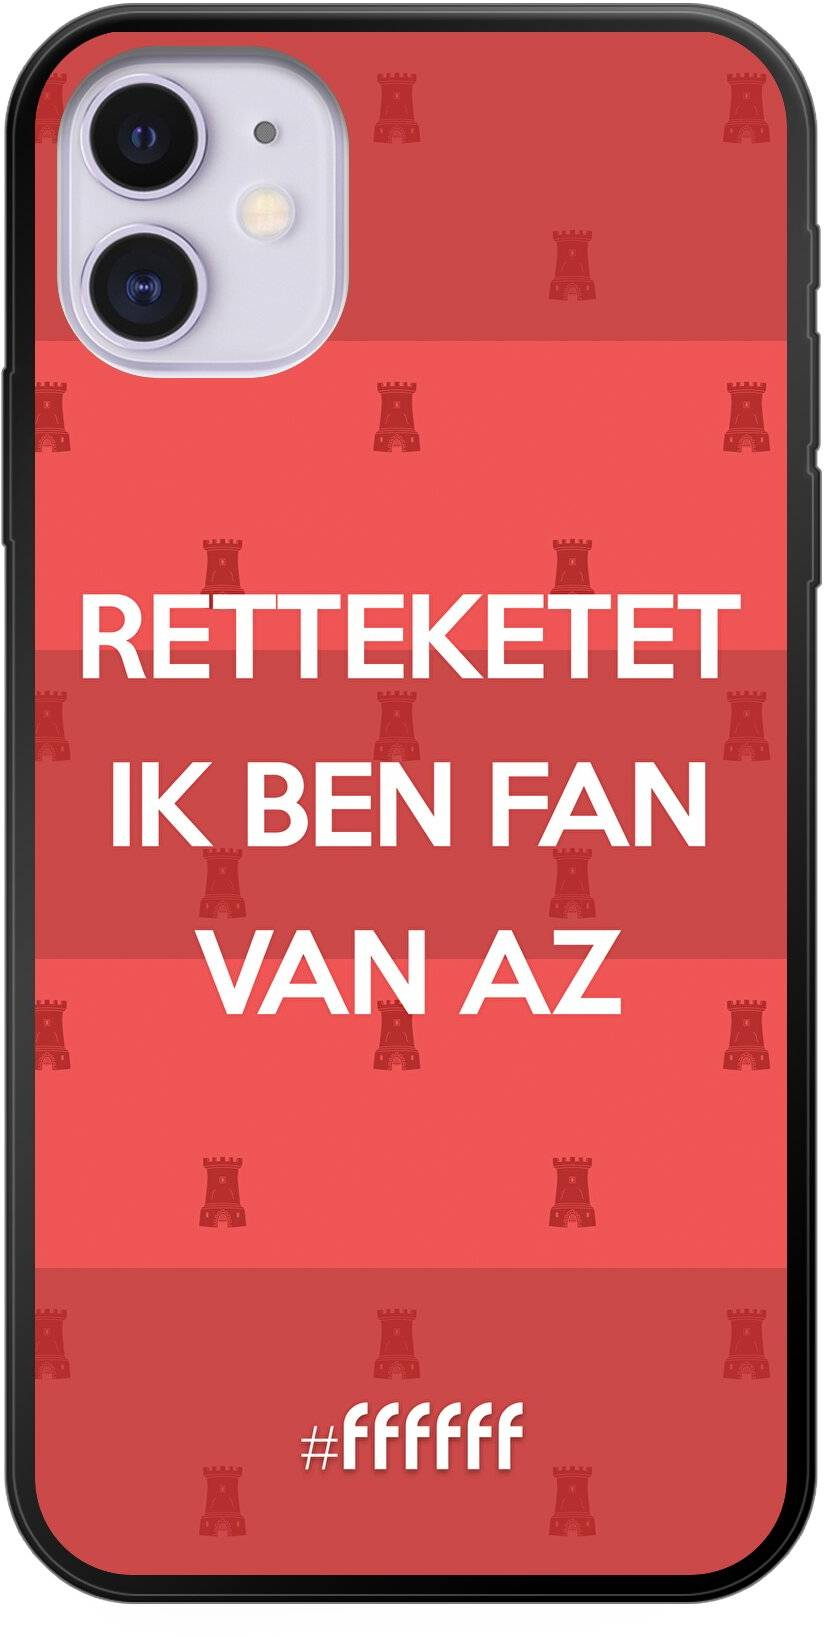 Retteketet ik ben fan van AZ iPhone 11